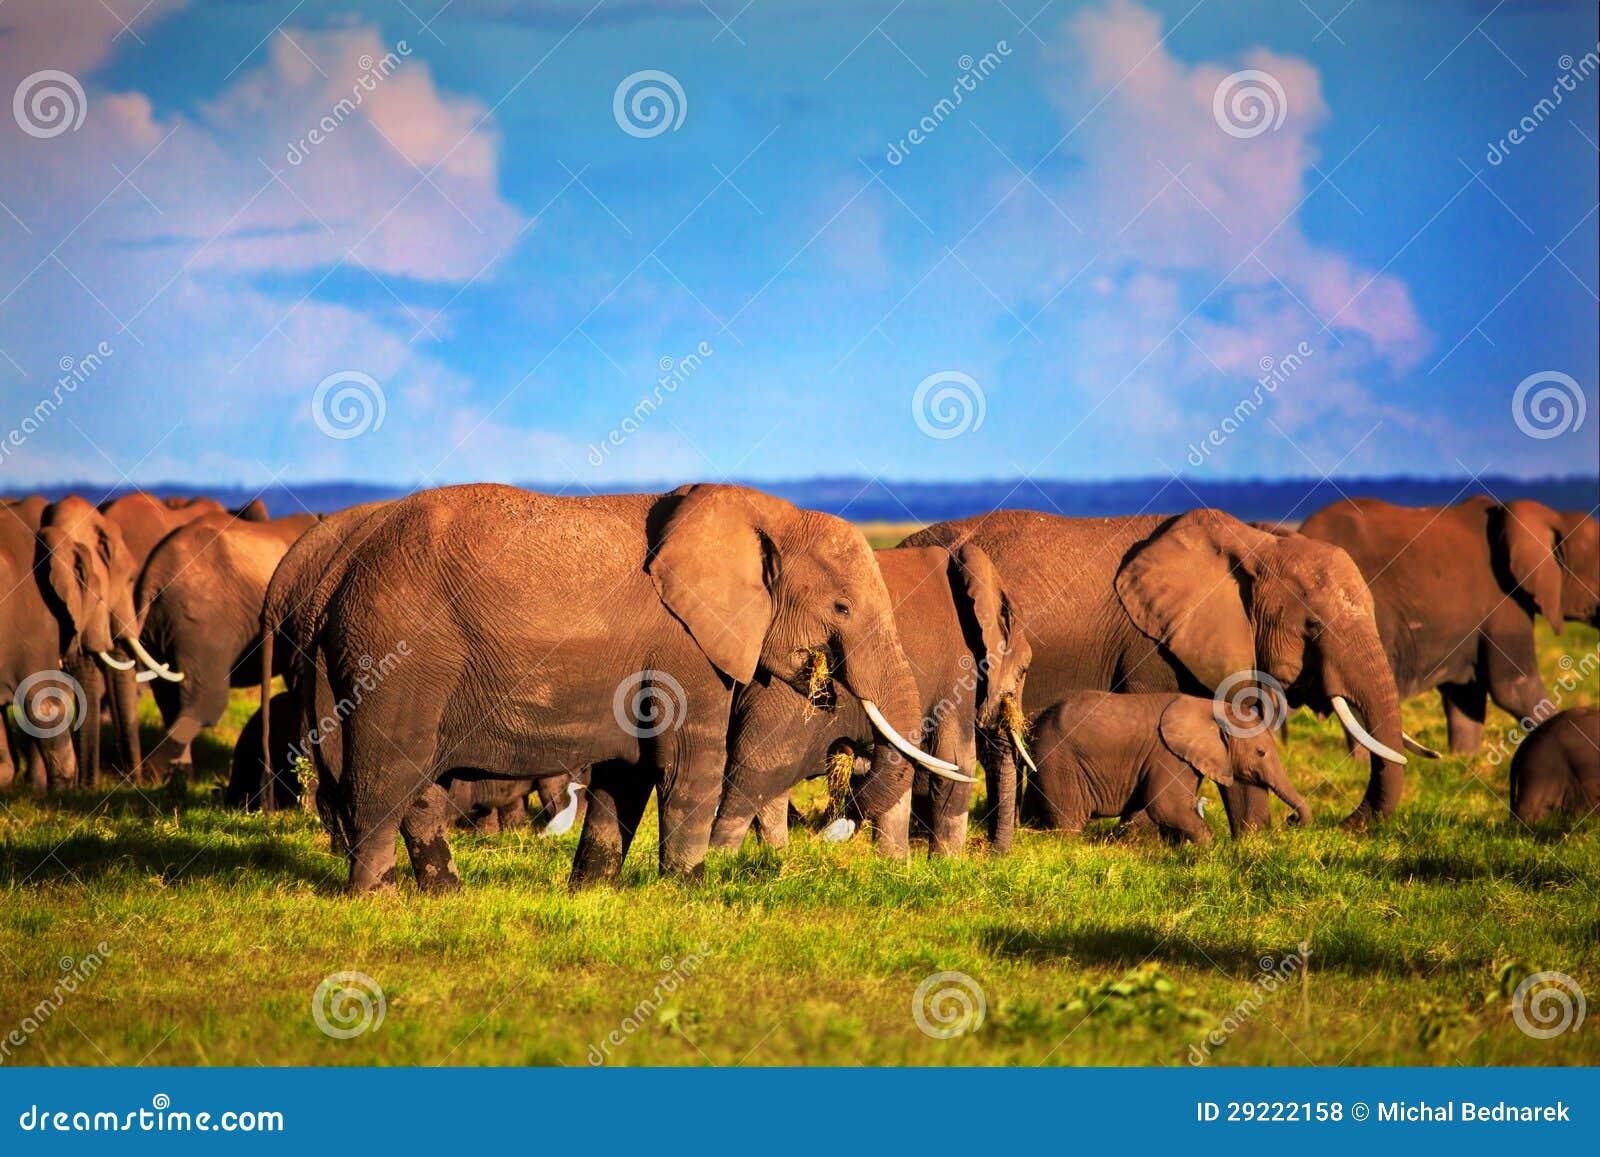 Manada de los elefantes en sabana. Safari en Amboseli, Kenia, África